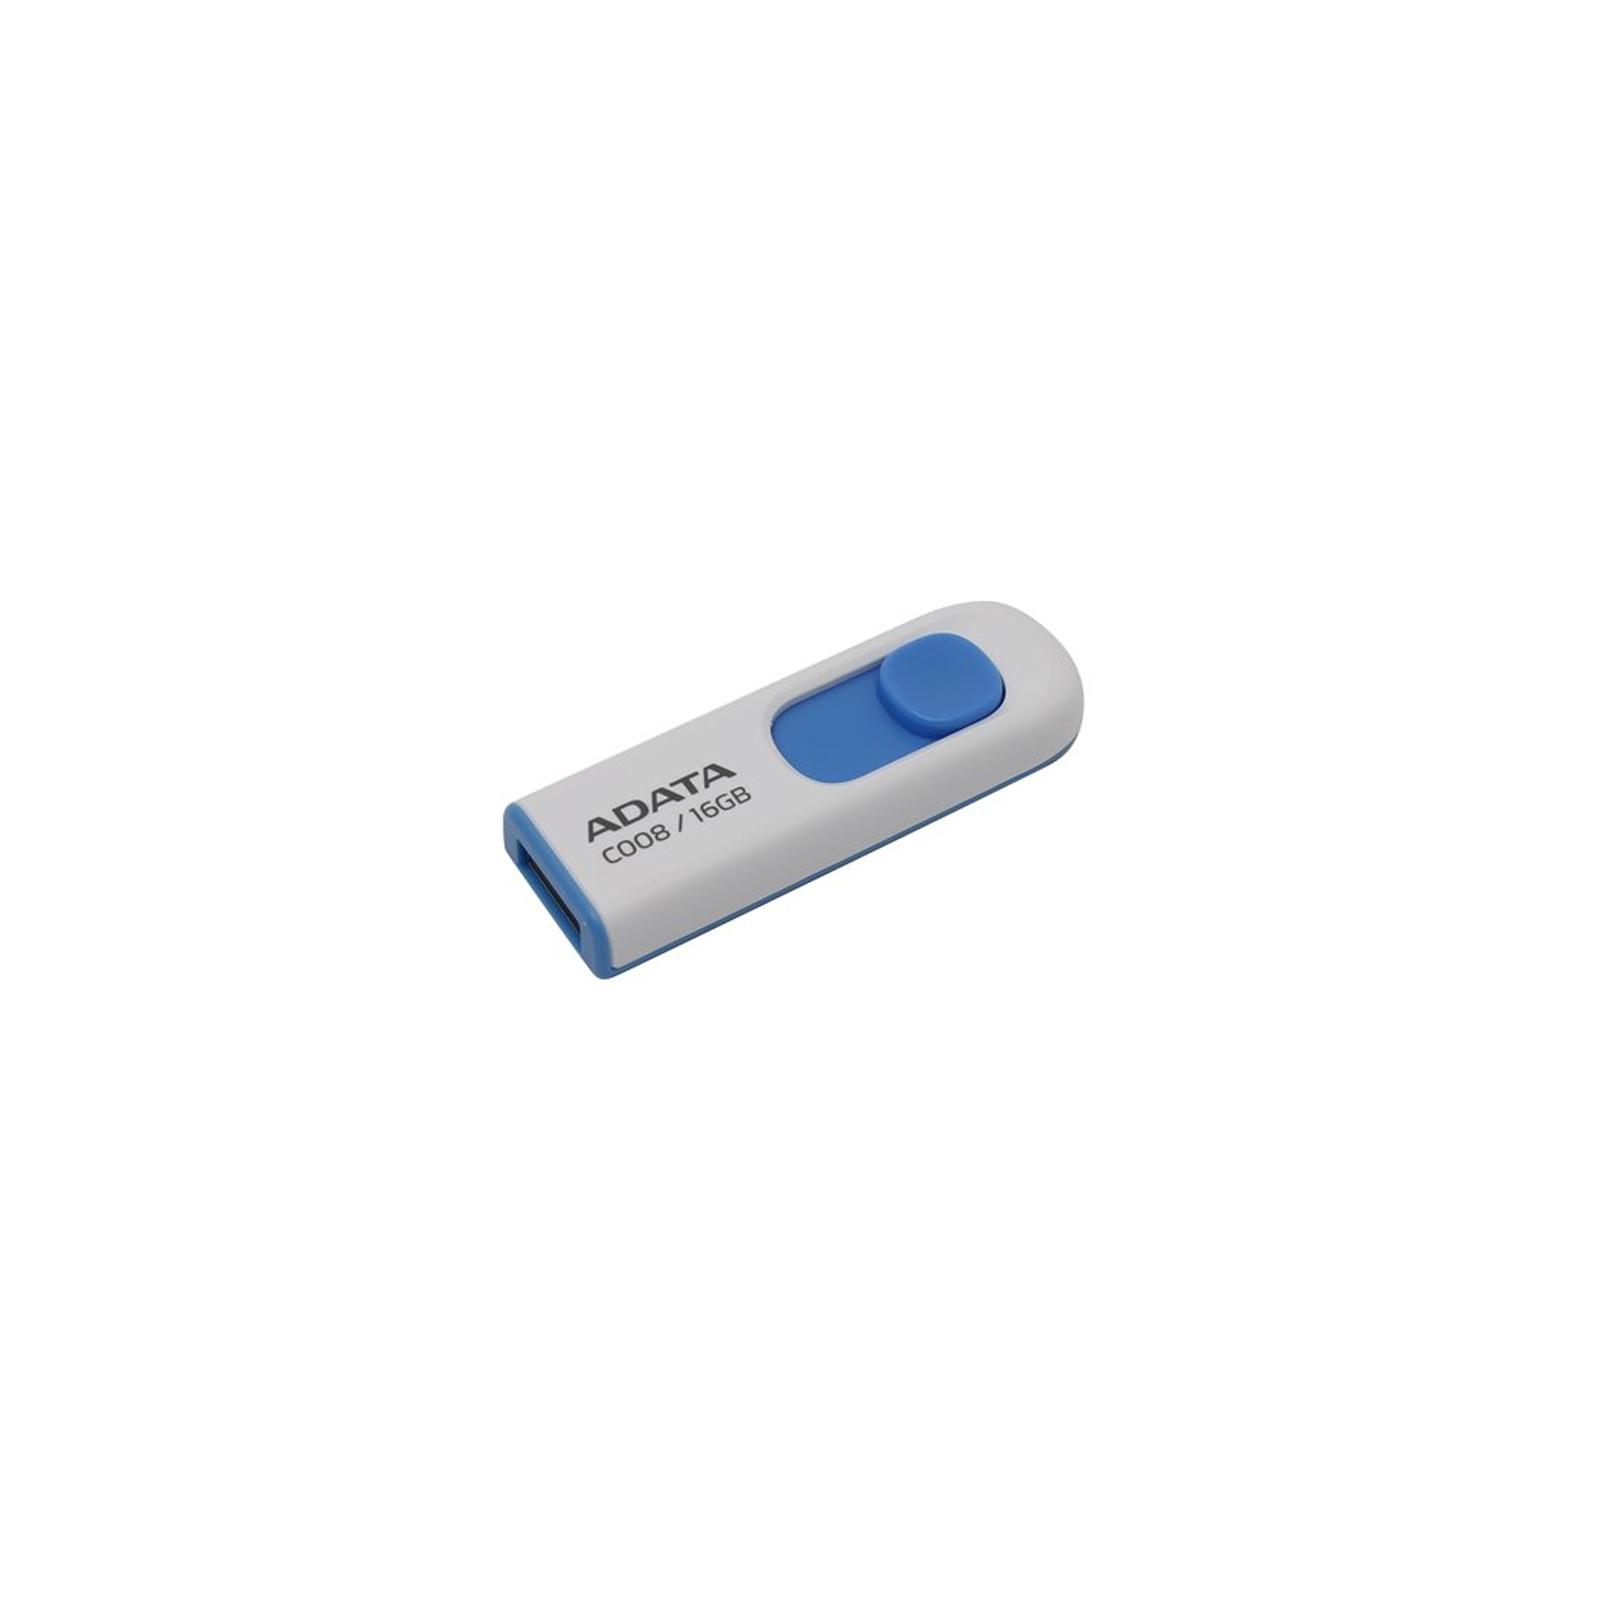 USB флеш накопитель ADATA 16Gb C008 Black/Red USB 2.0 (AC008-16G-RKD) изображение 2